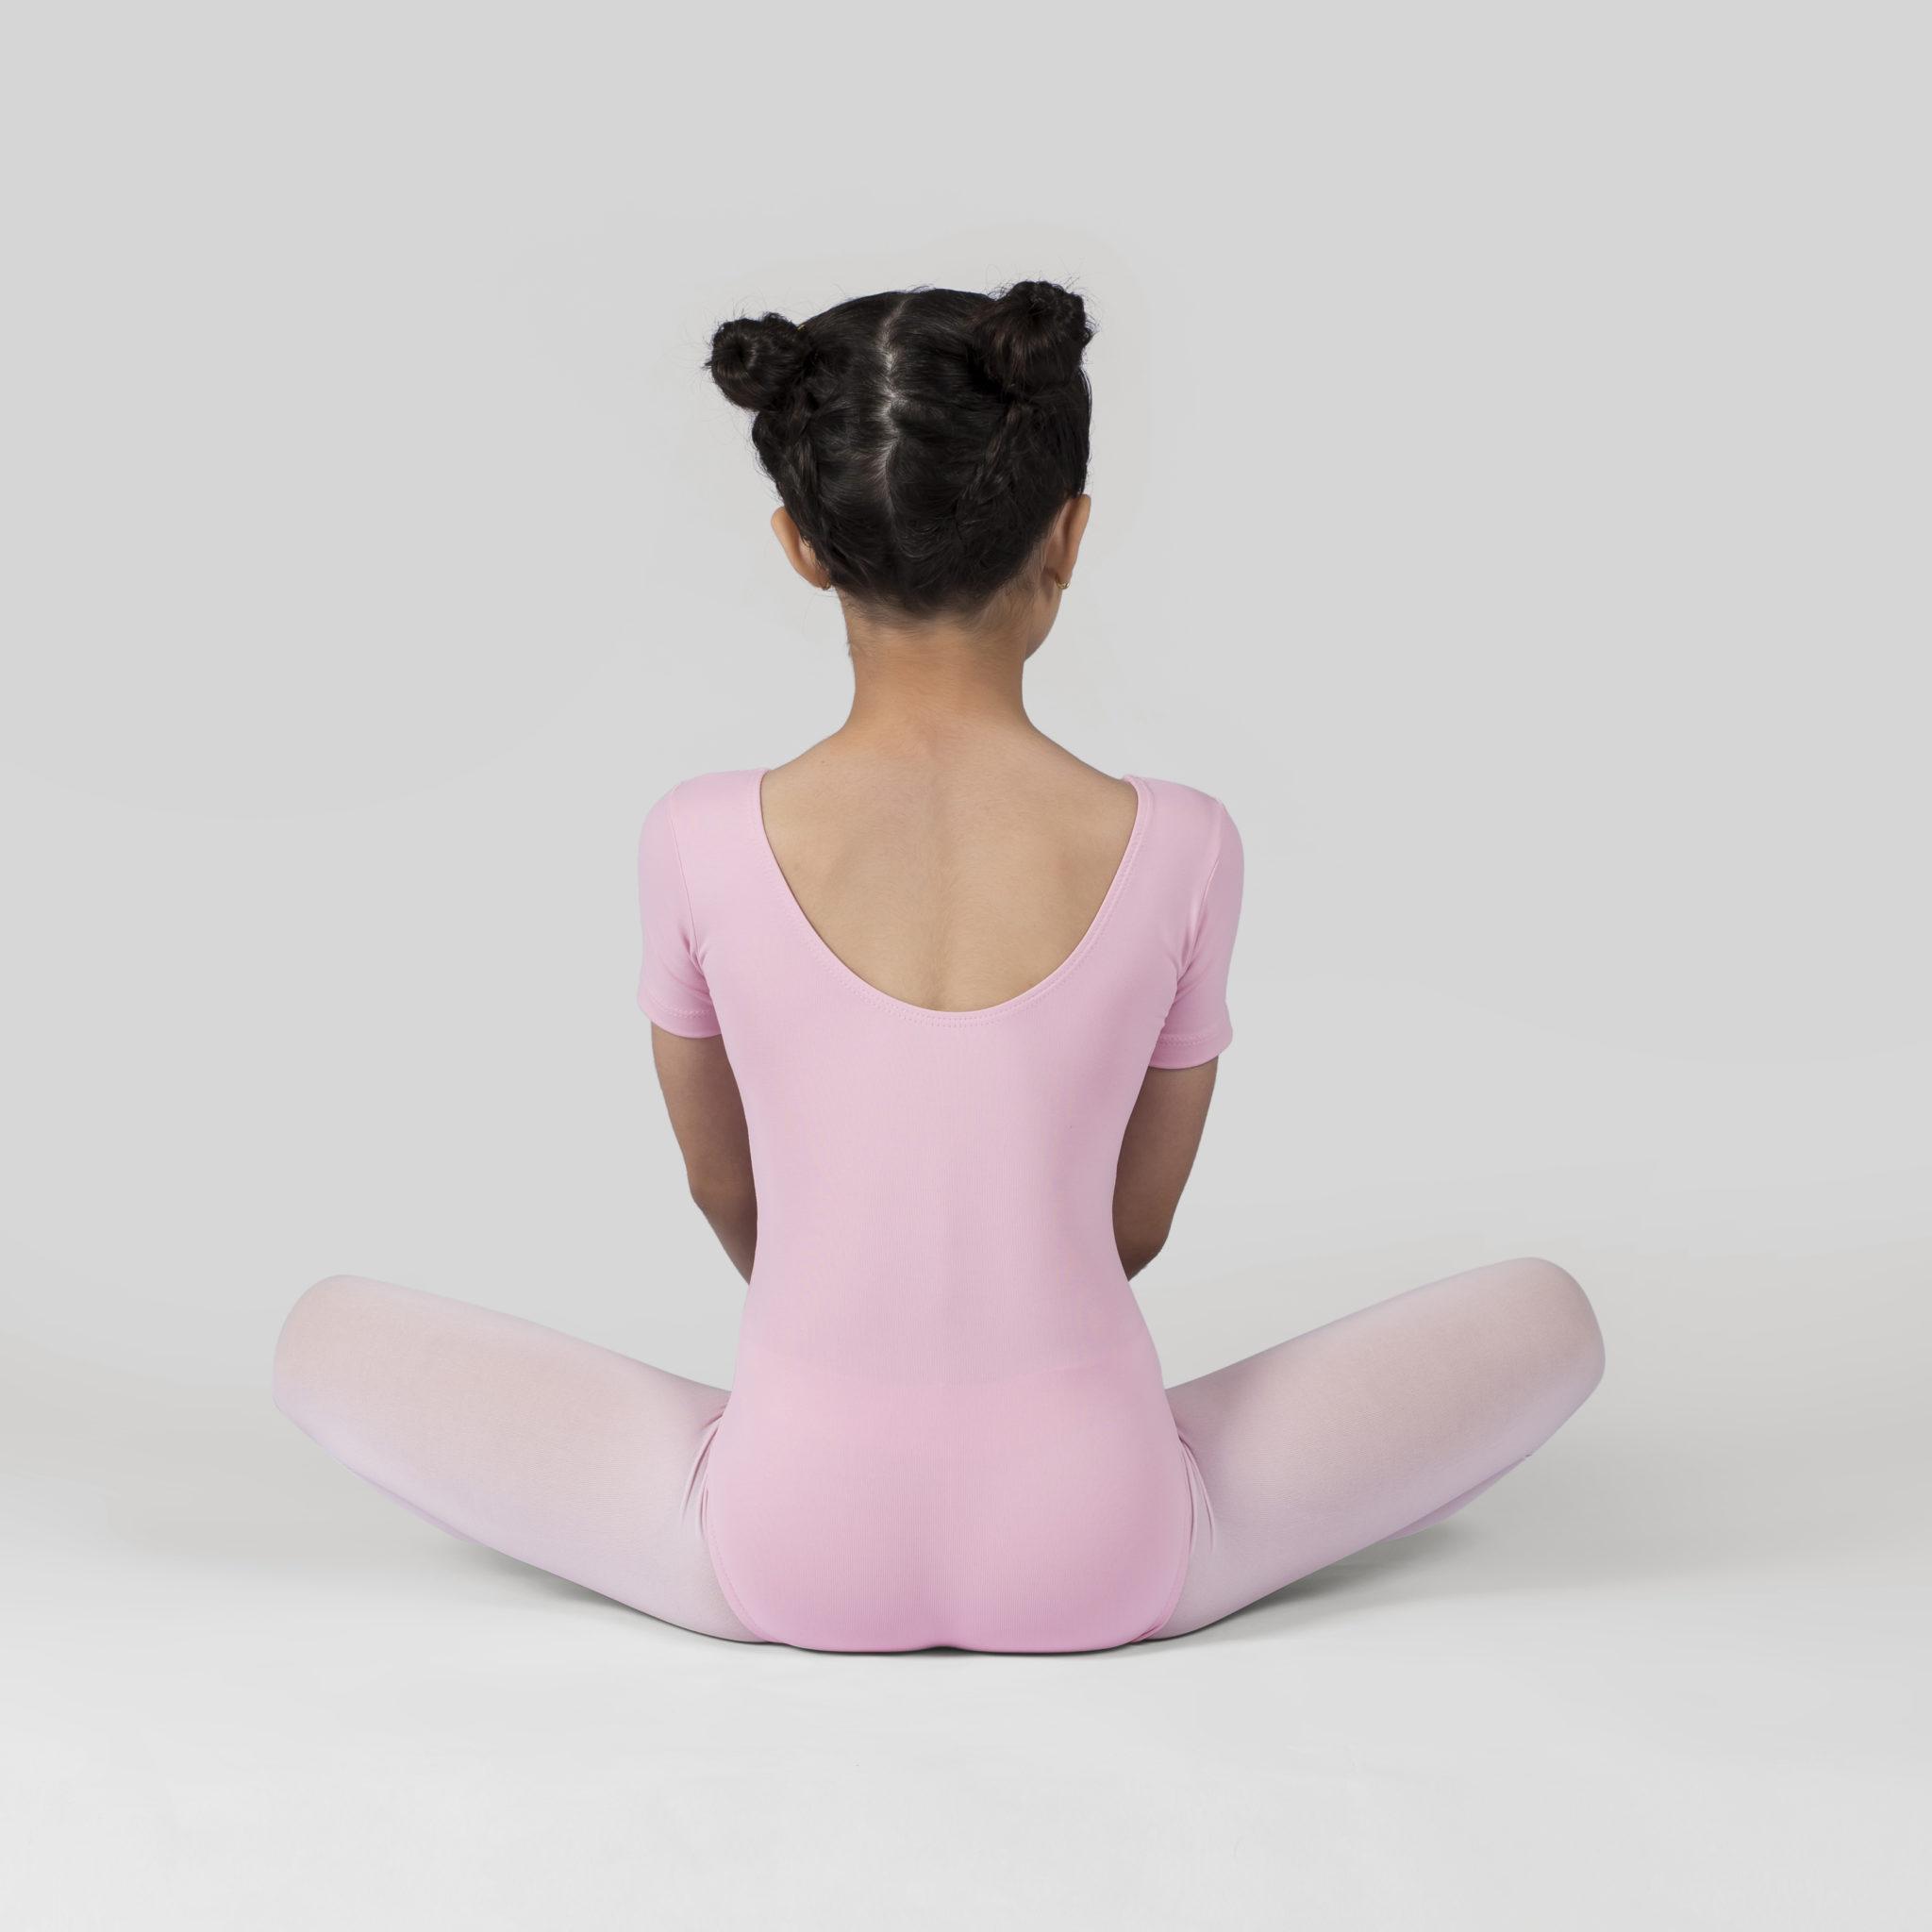 8e161820e9 Collant Meia Manga Decote Redondo Adulto- 106 - Evidence Ballet ...